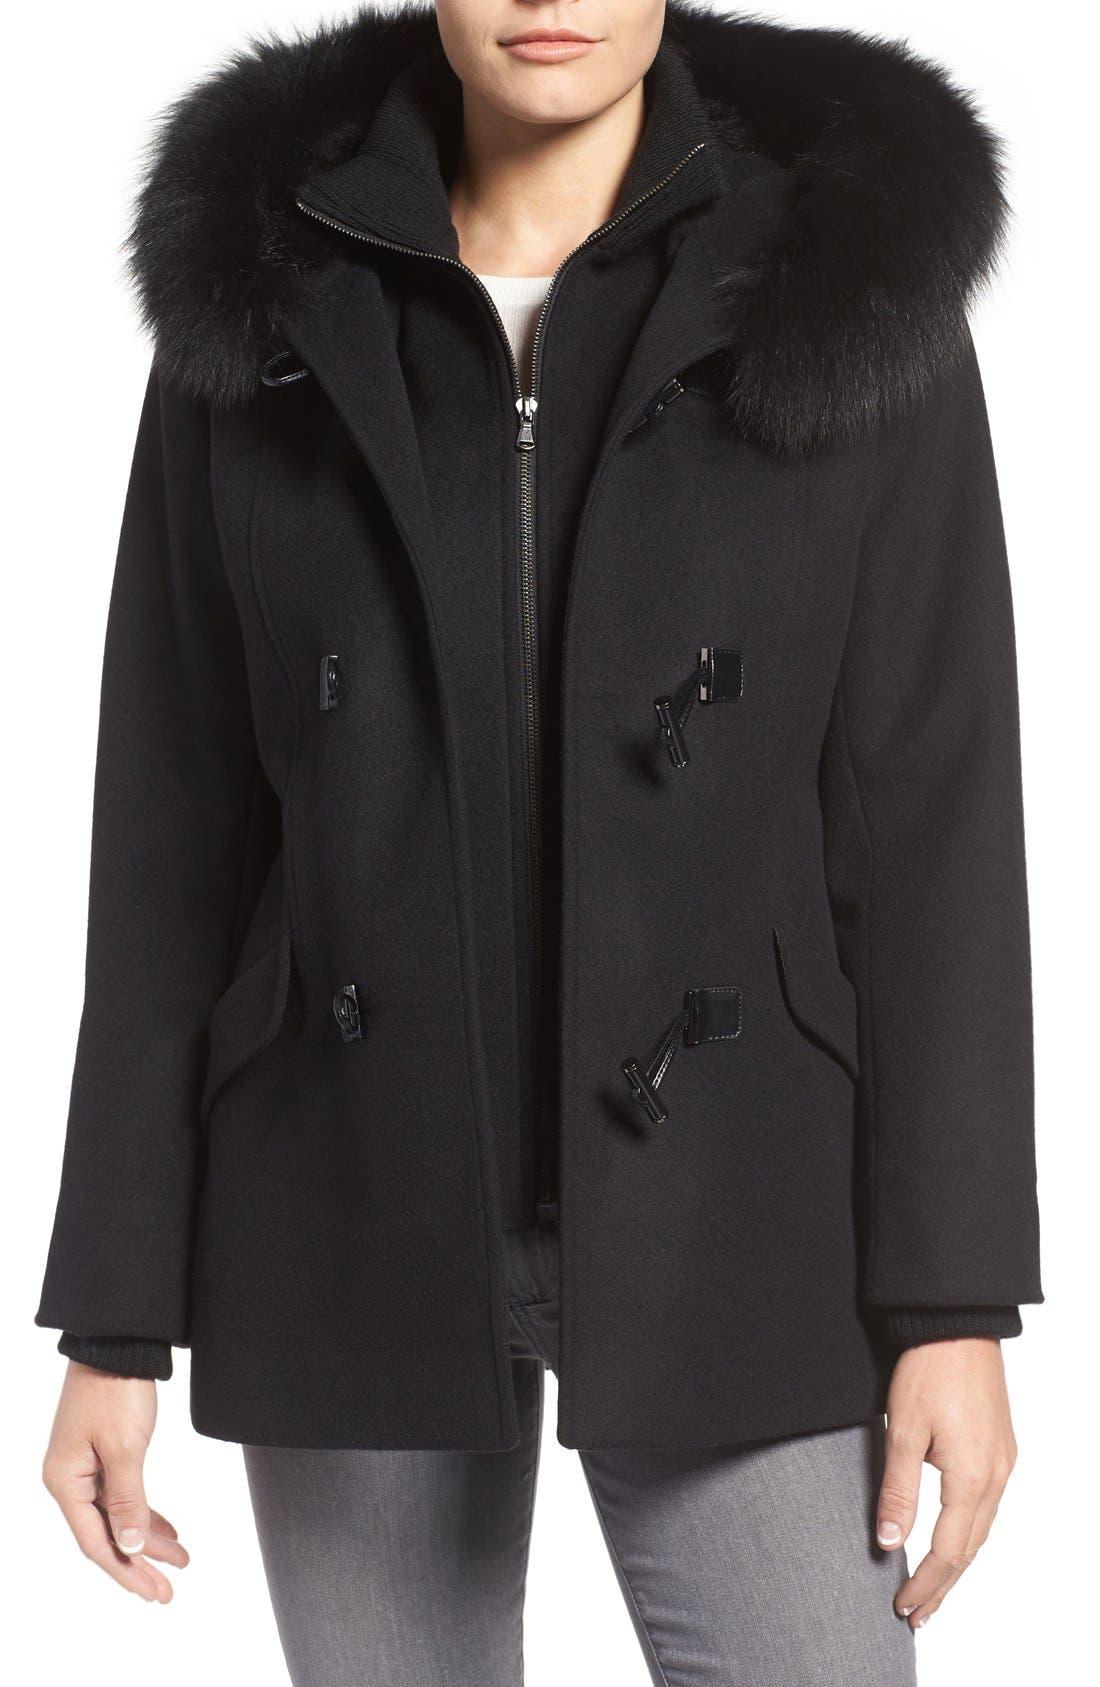 Main Image - George Simonton Wool Blend Duffle Coat with Genuine Fox Fur Trim